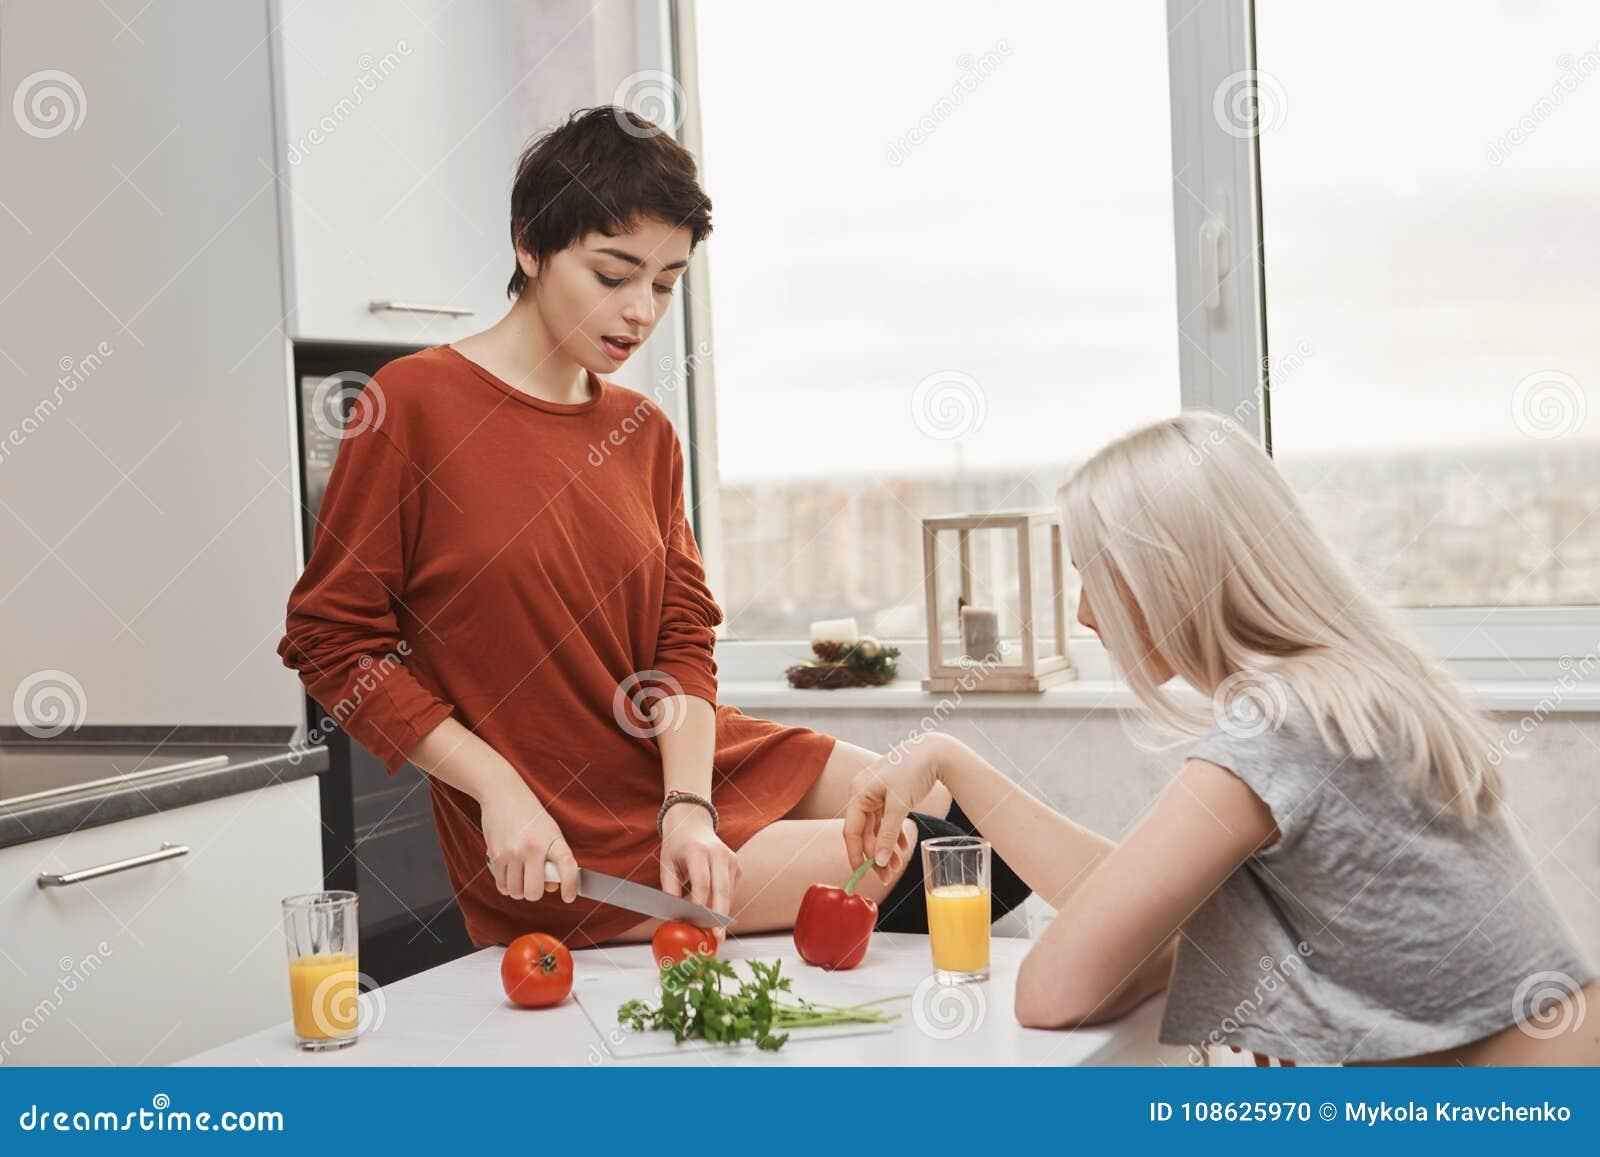 Mentally handicapped girl sex video